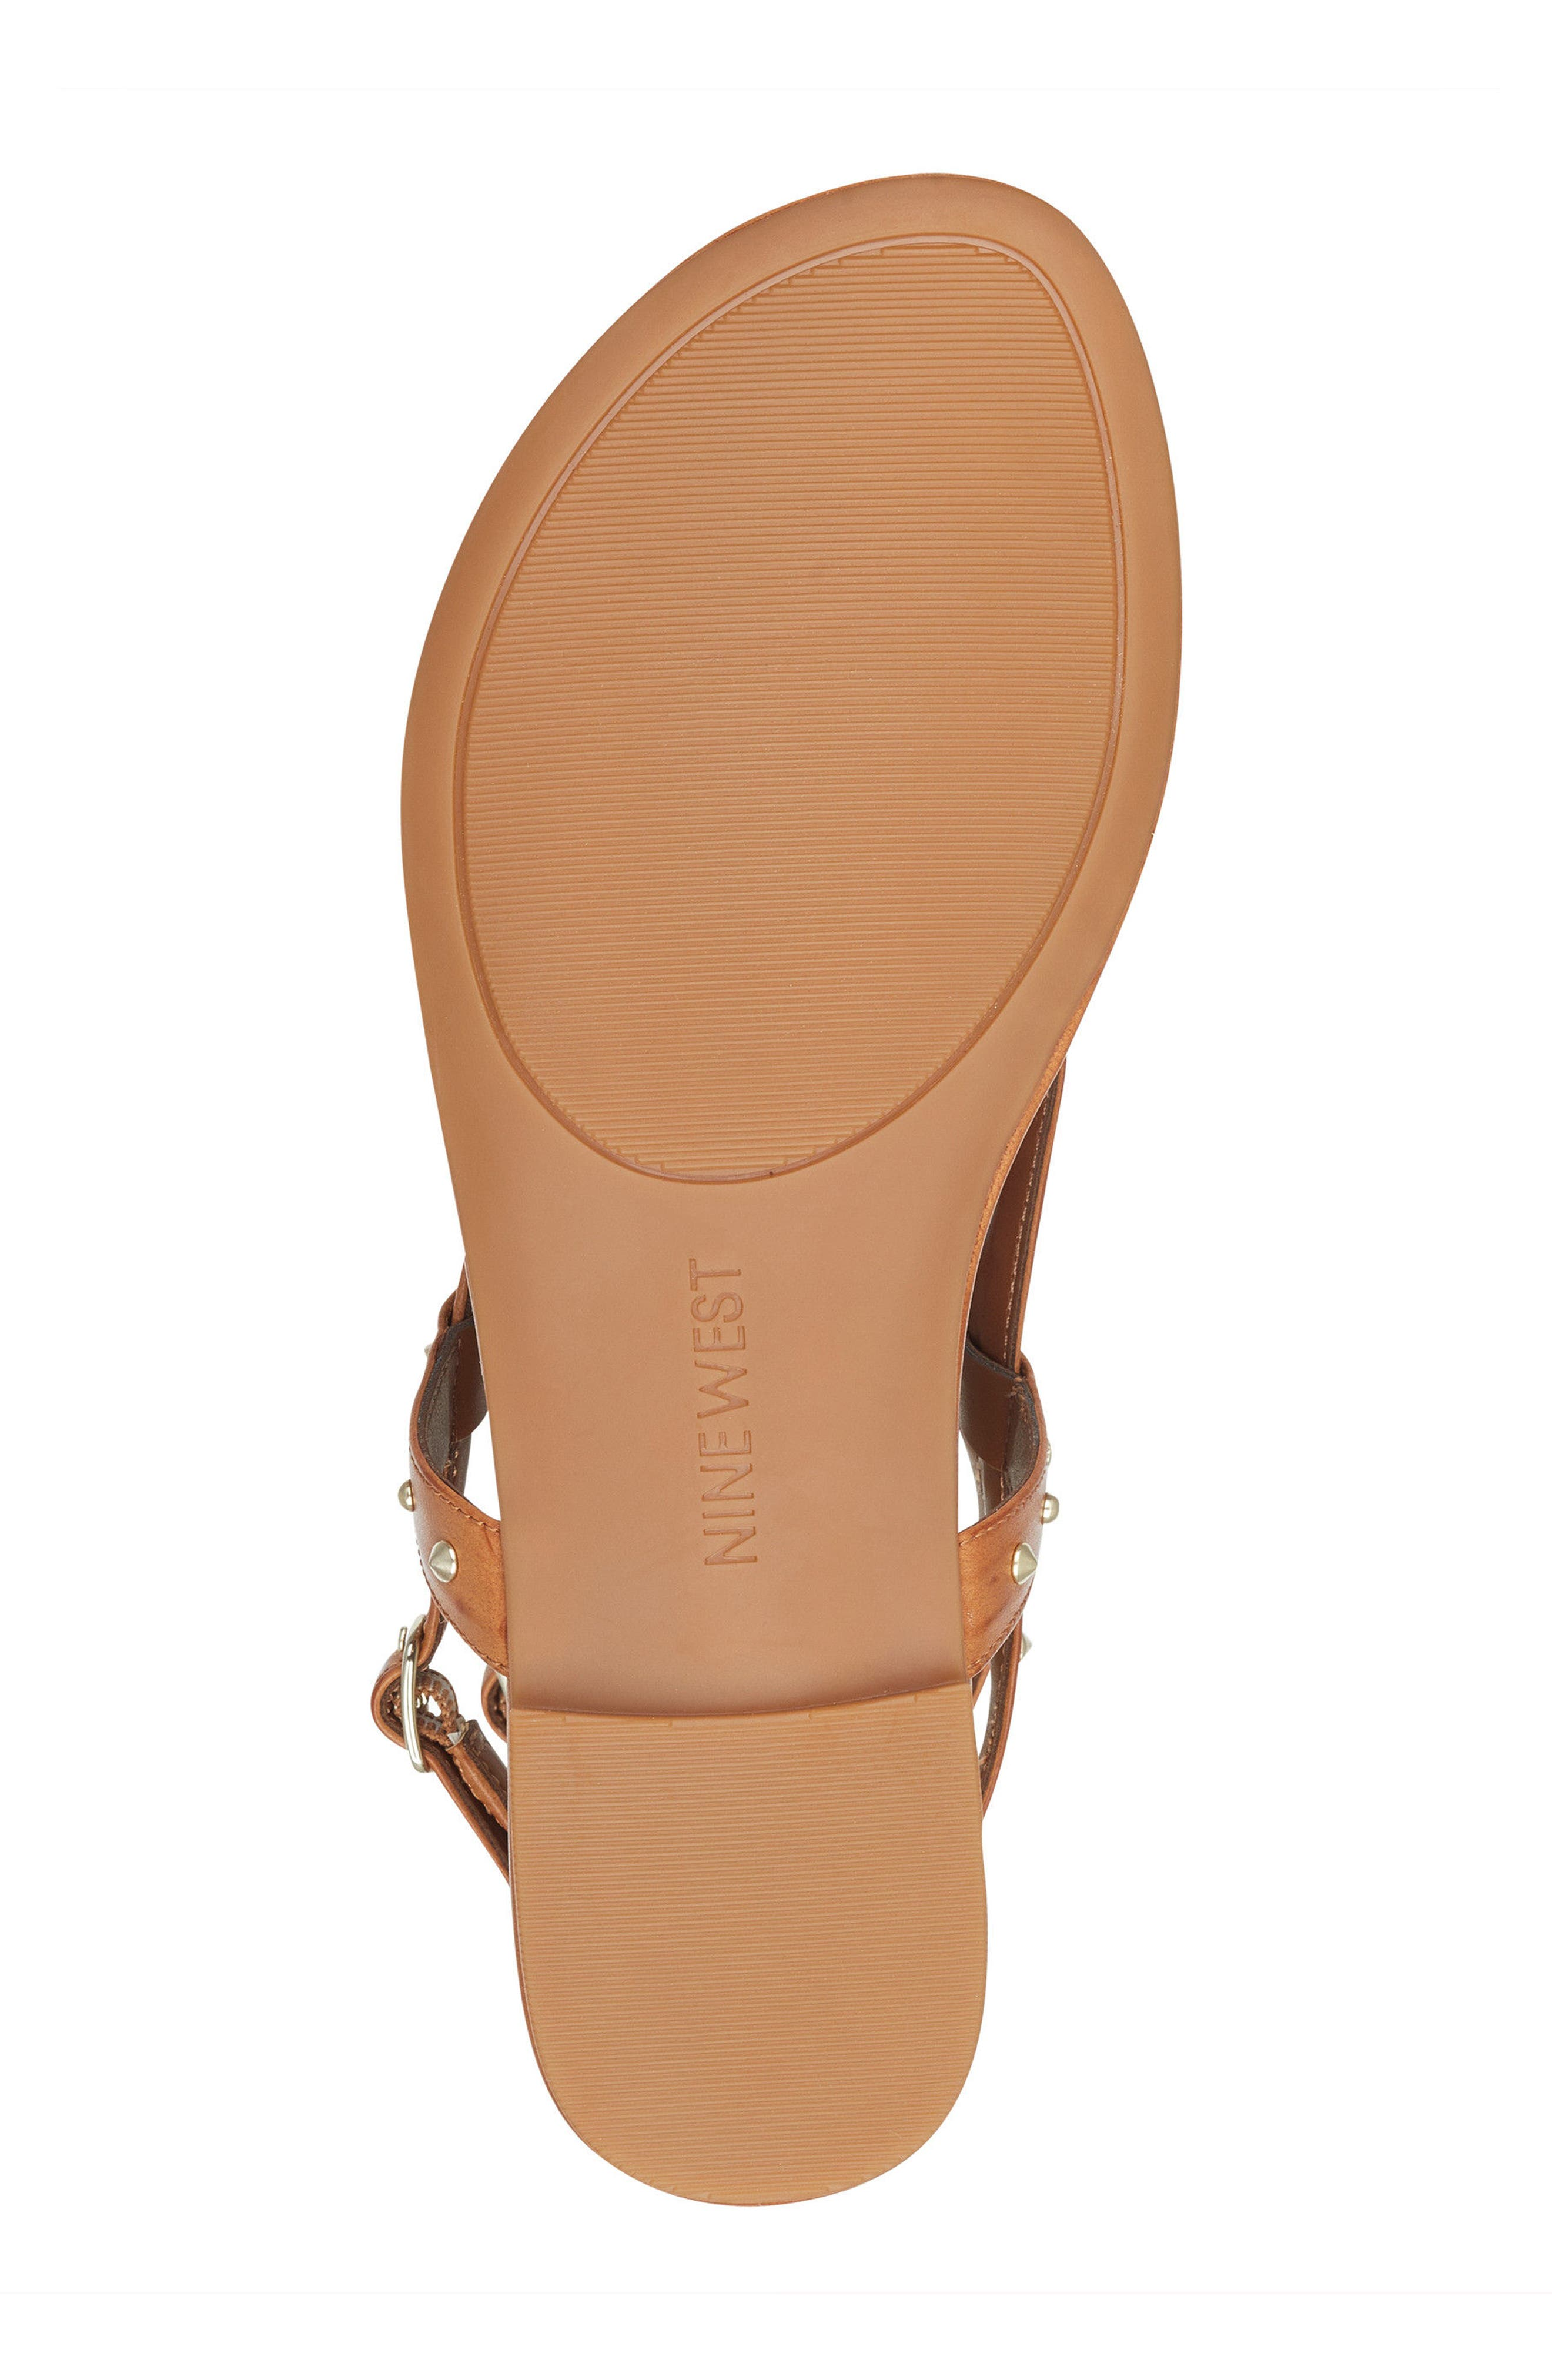 Simcha Studded Wraparound Sandal,                             Alternate thumbnail 6, color,                             Dark Natural Faux Leather